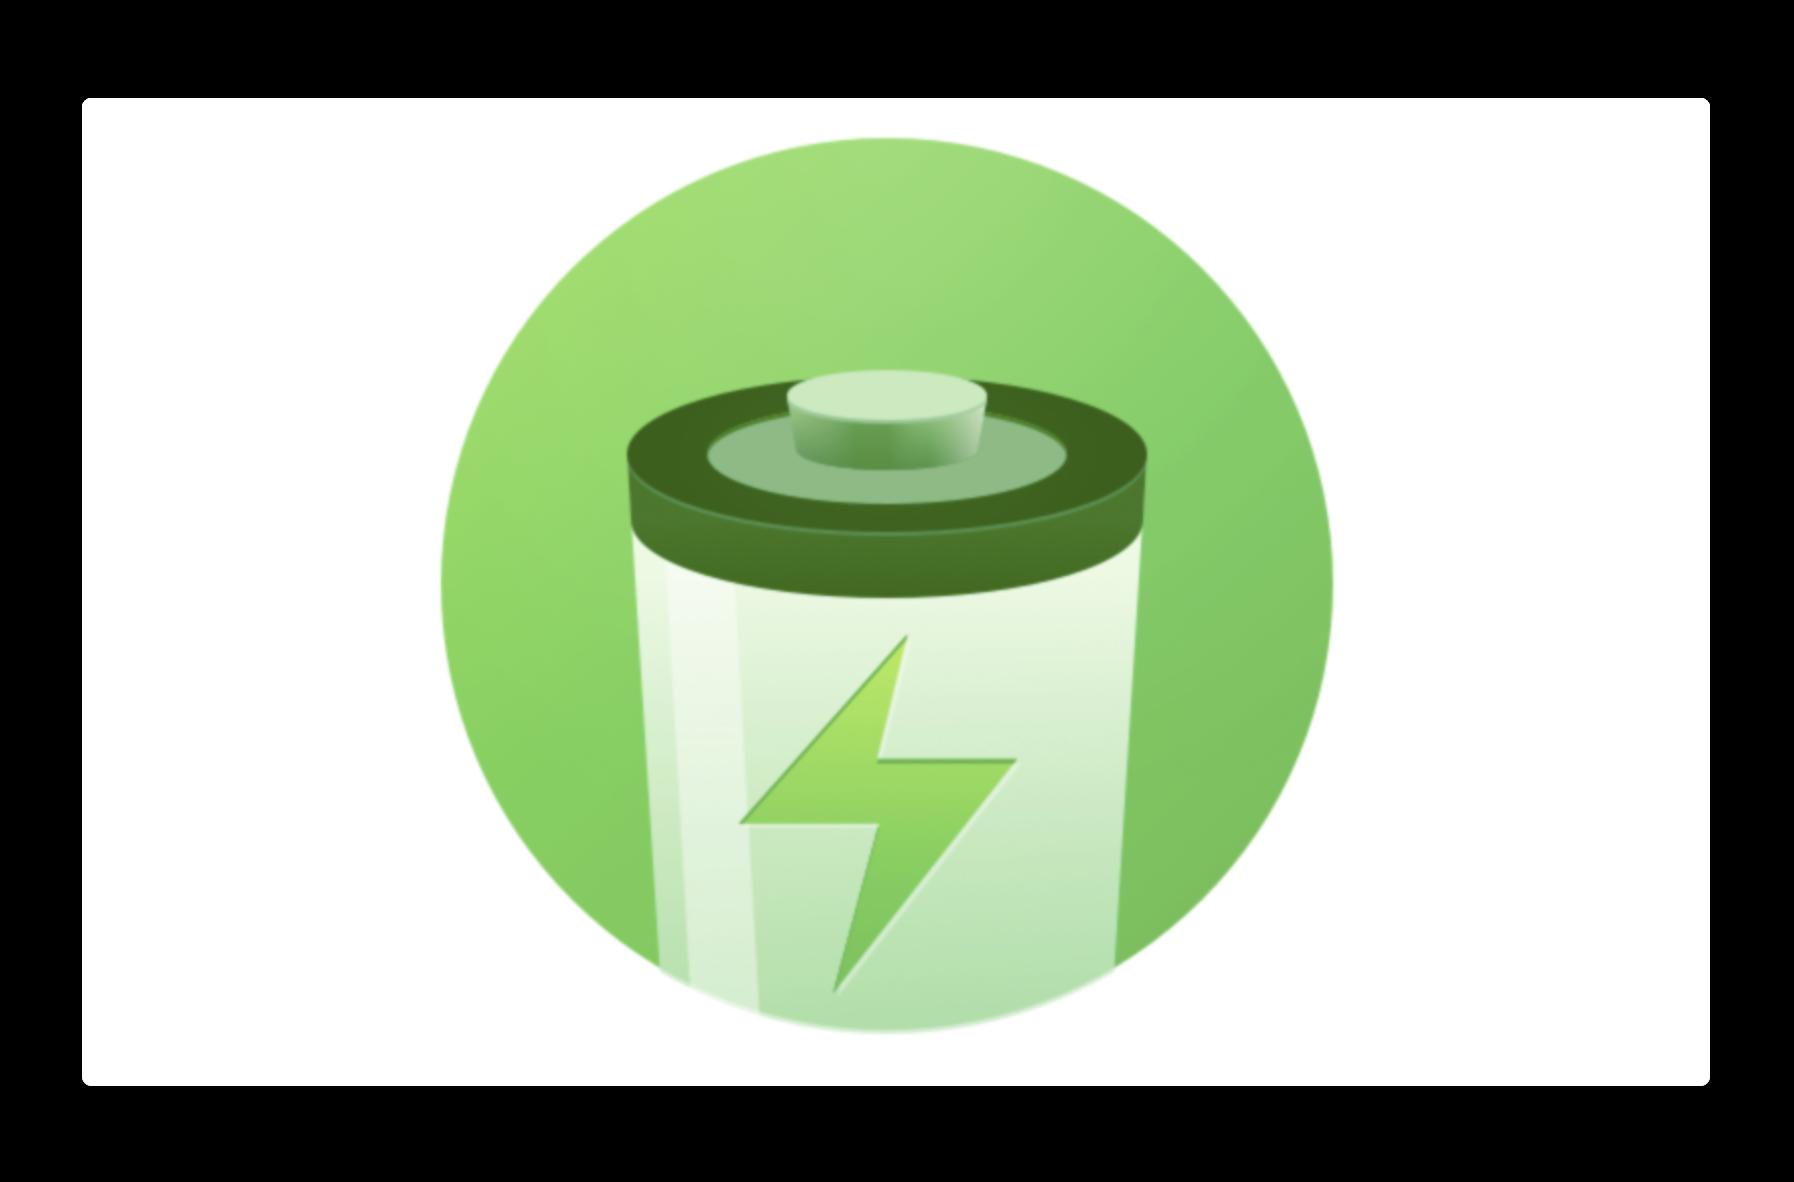 MacBookの無料のバッテリーモニターアプリ「Dr. Battery」がリリース